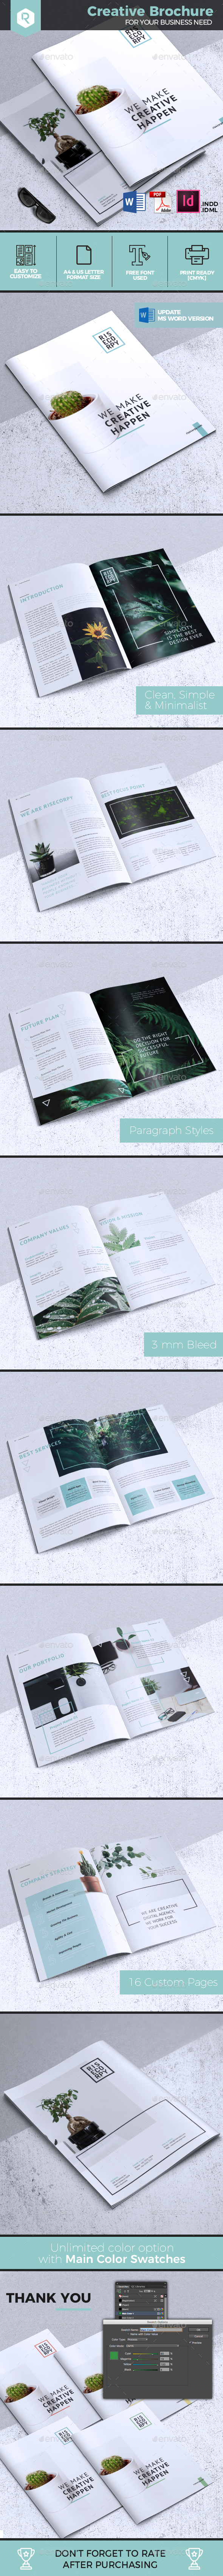 Creative Brochure Template Vol. 33 - Corporate Brochures